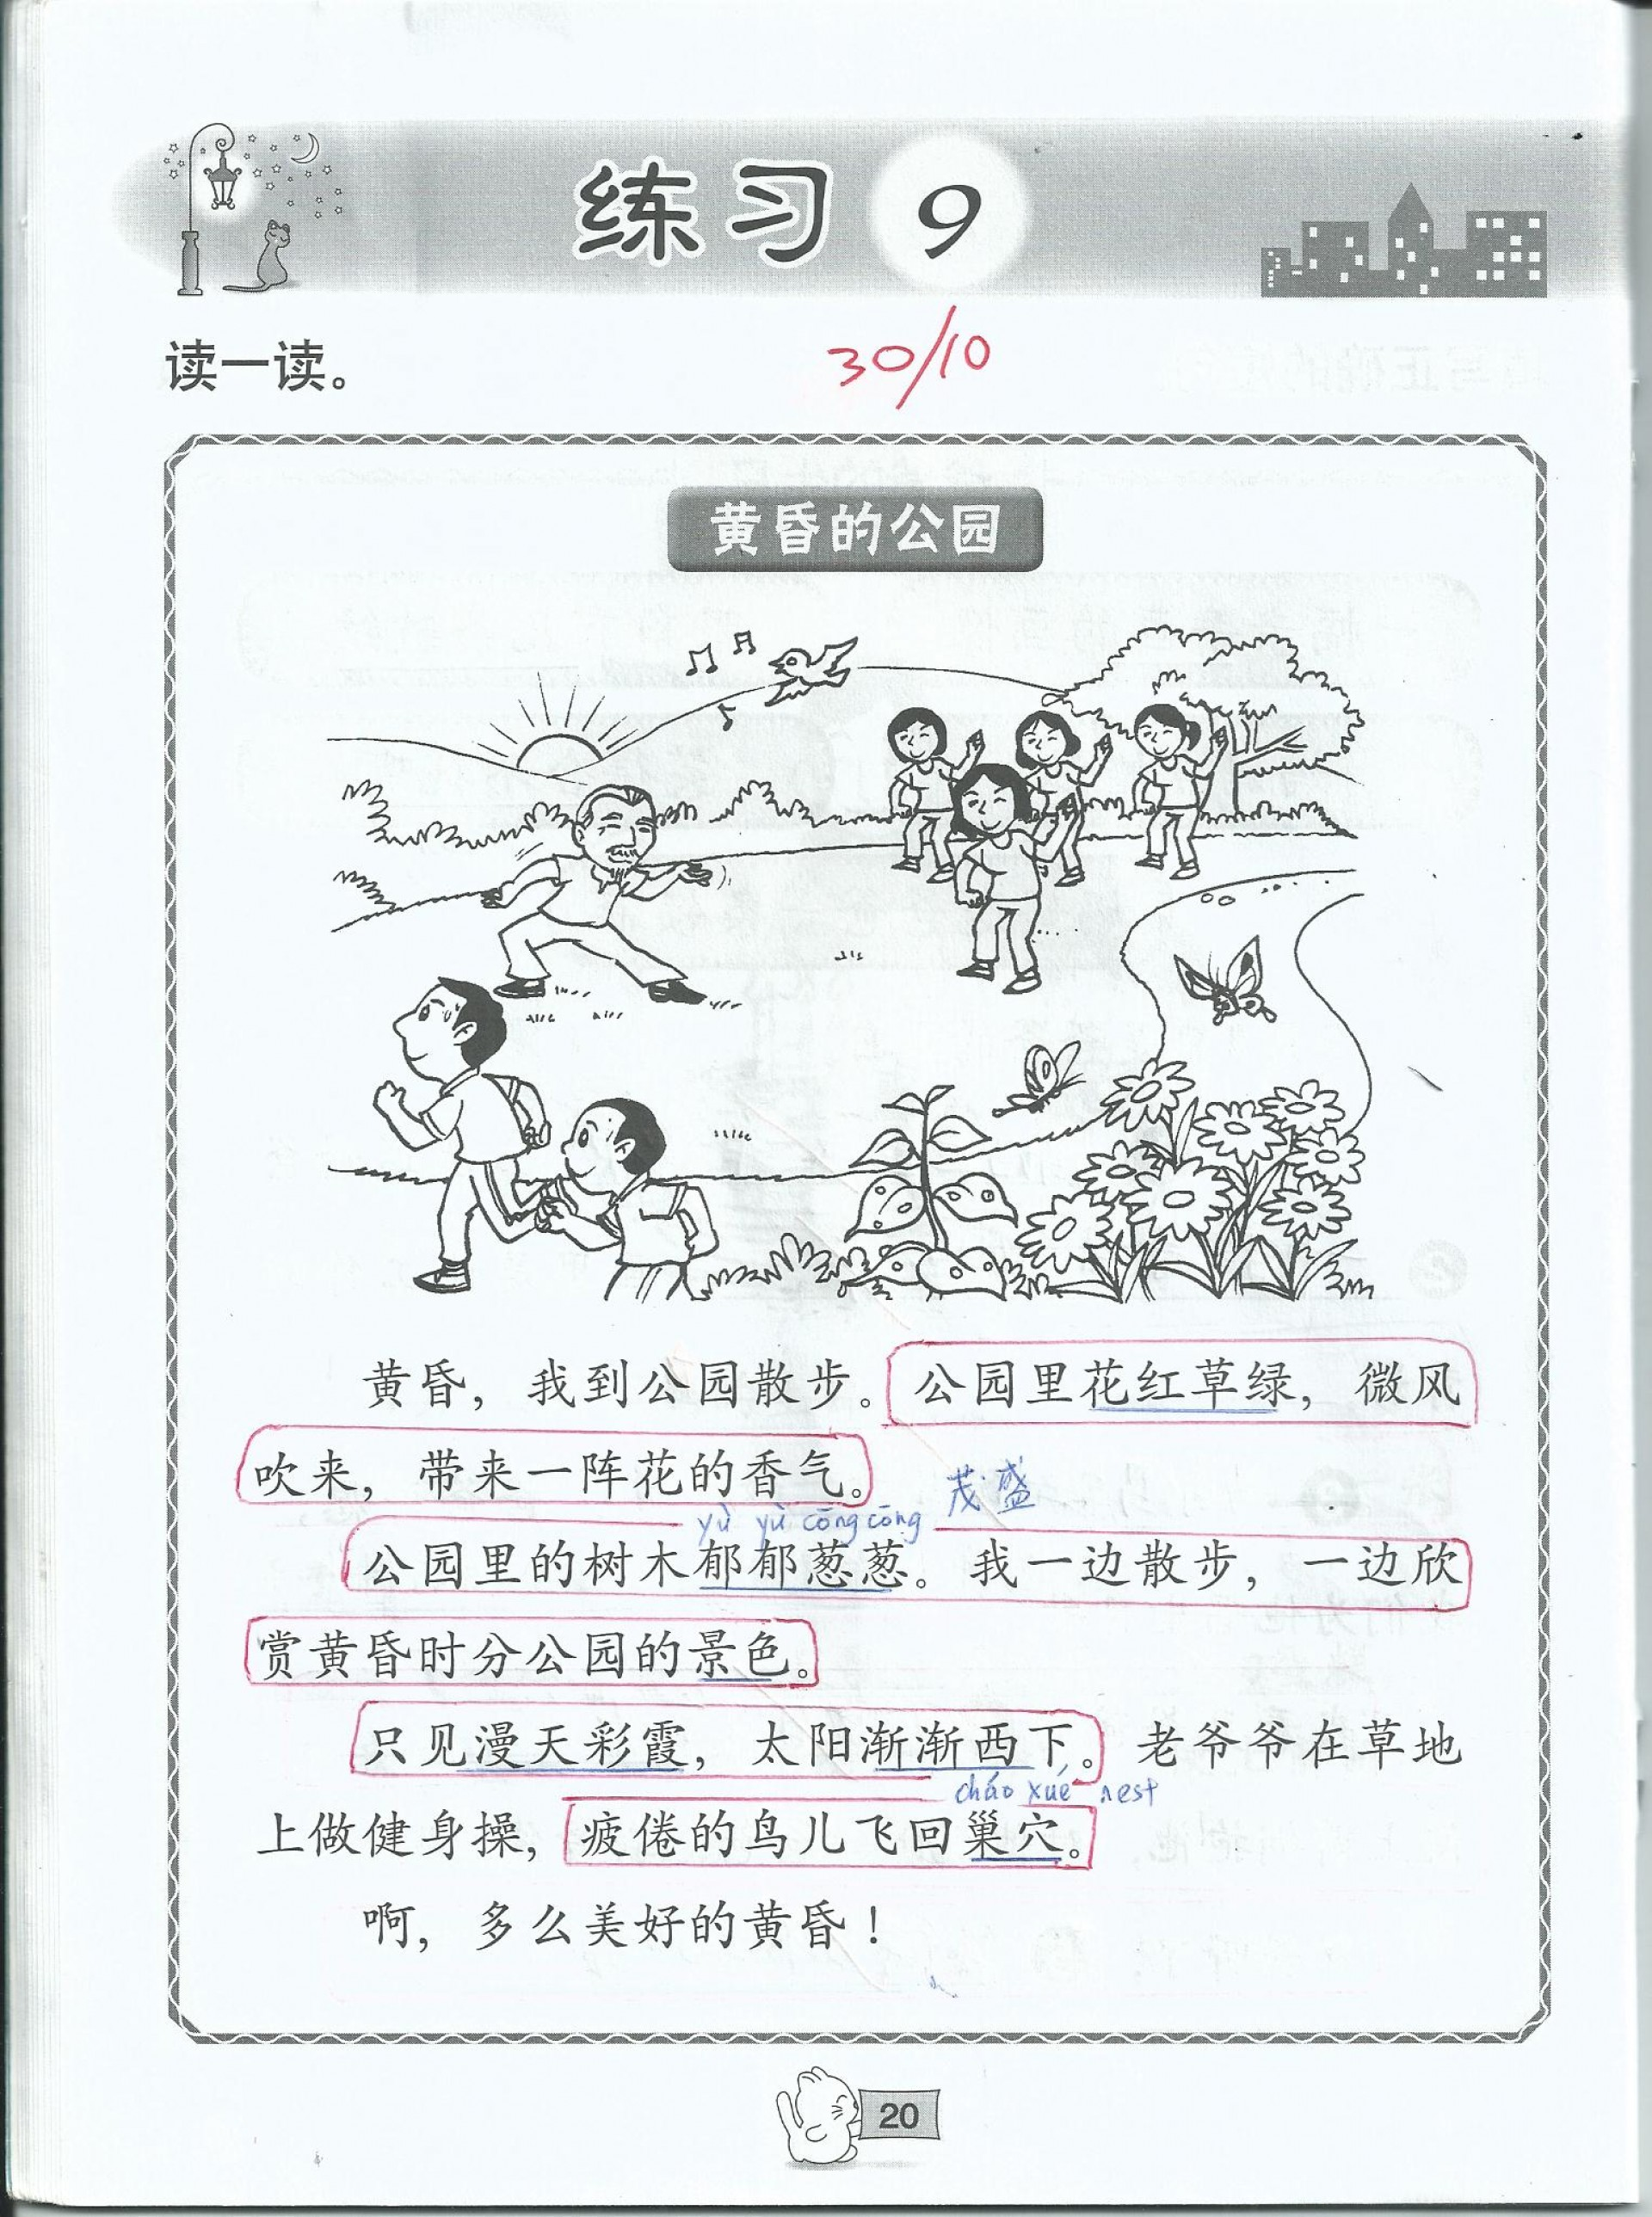 005 Writing00031 Chinese Essay Amazing Art Topics Vce Formats Sheet 1920